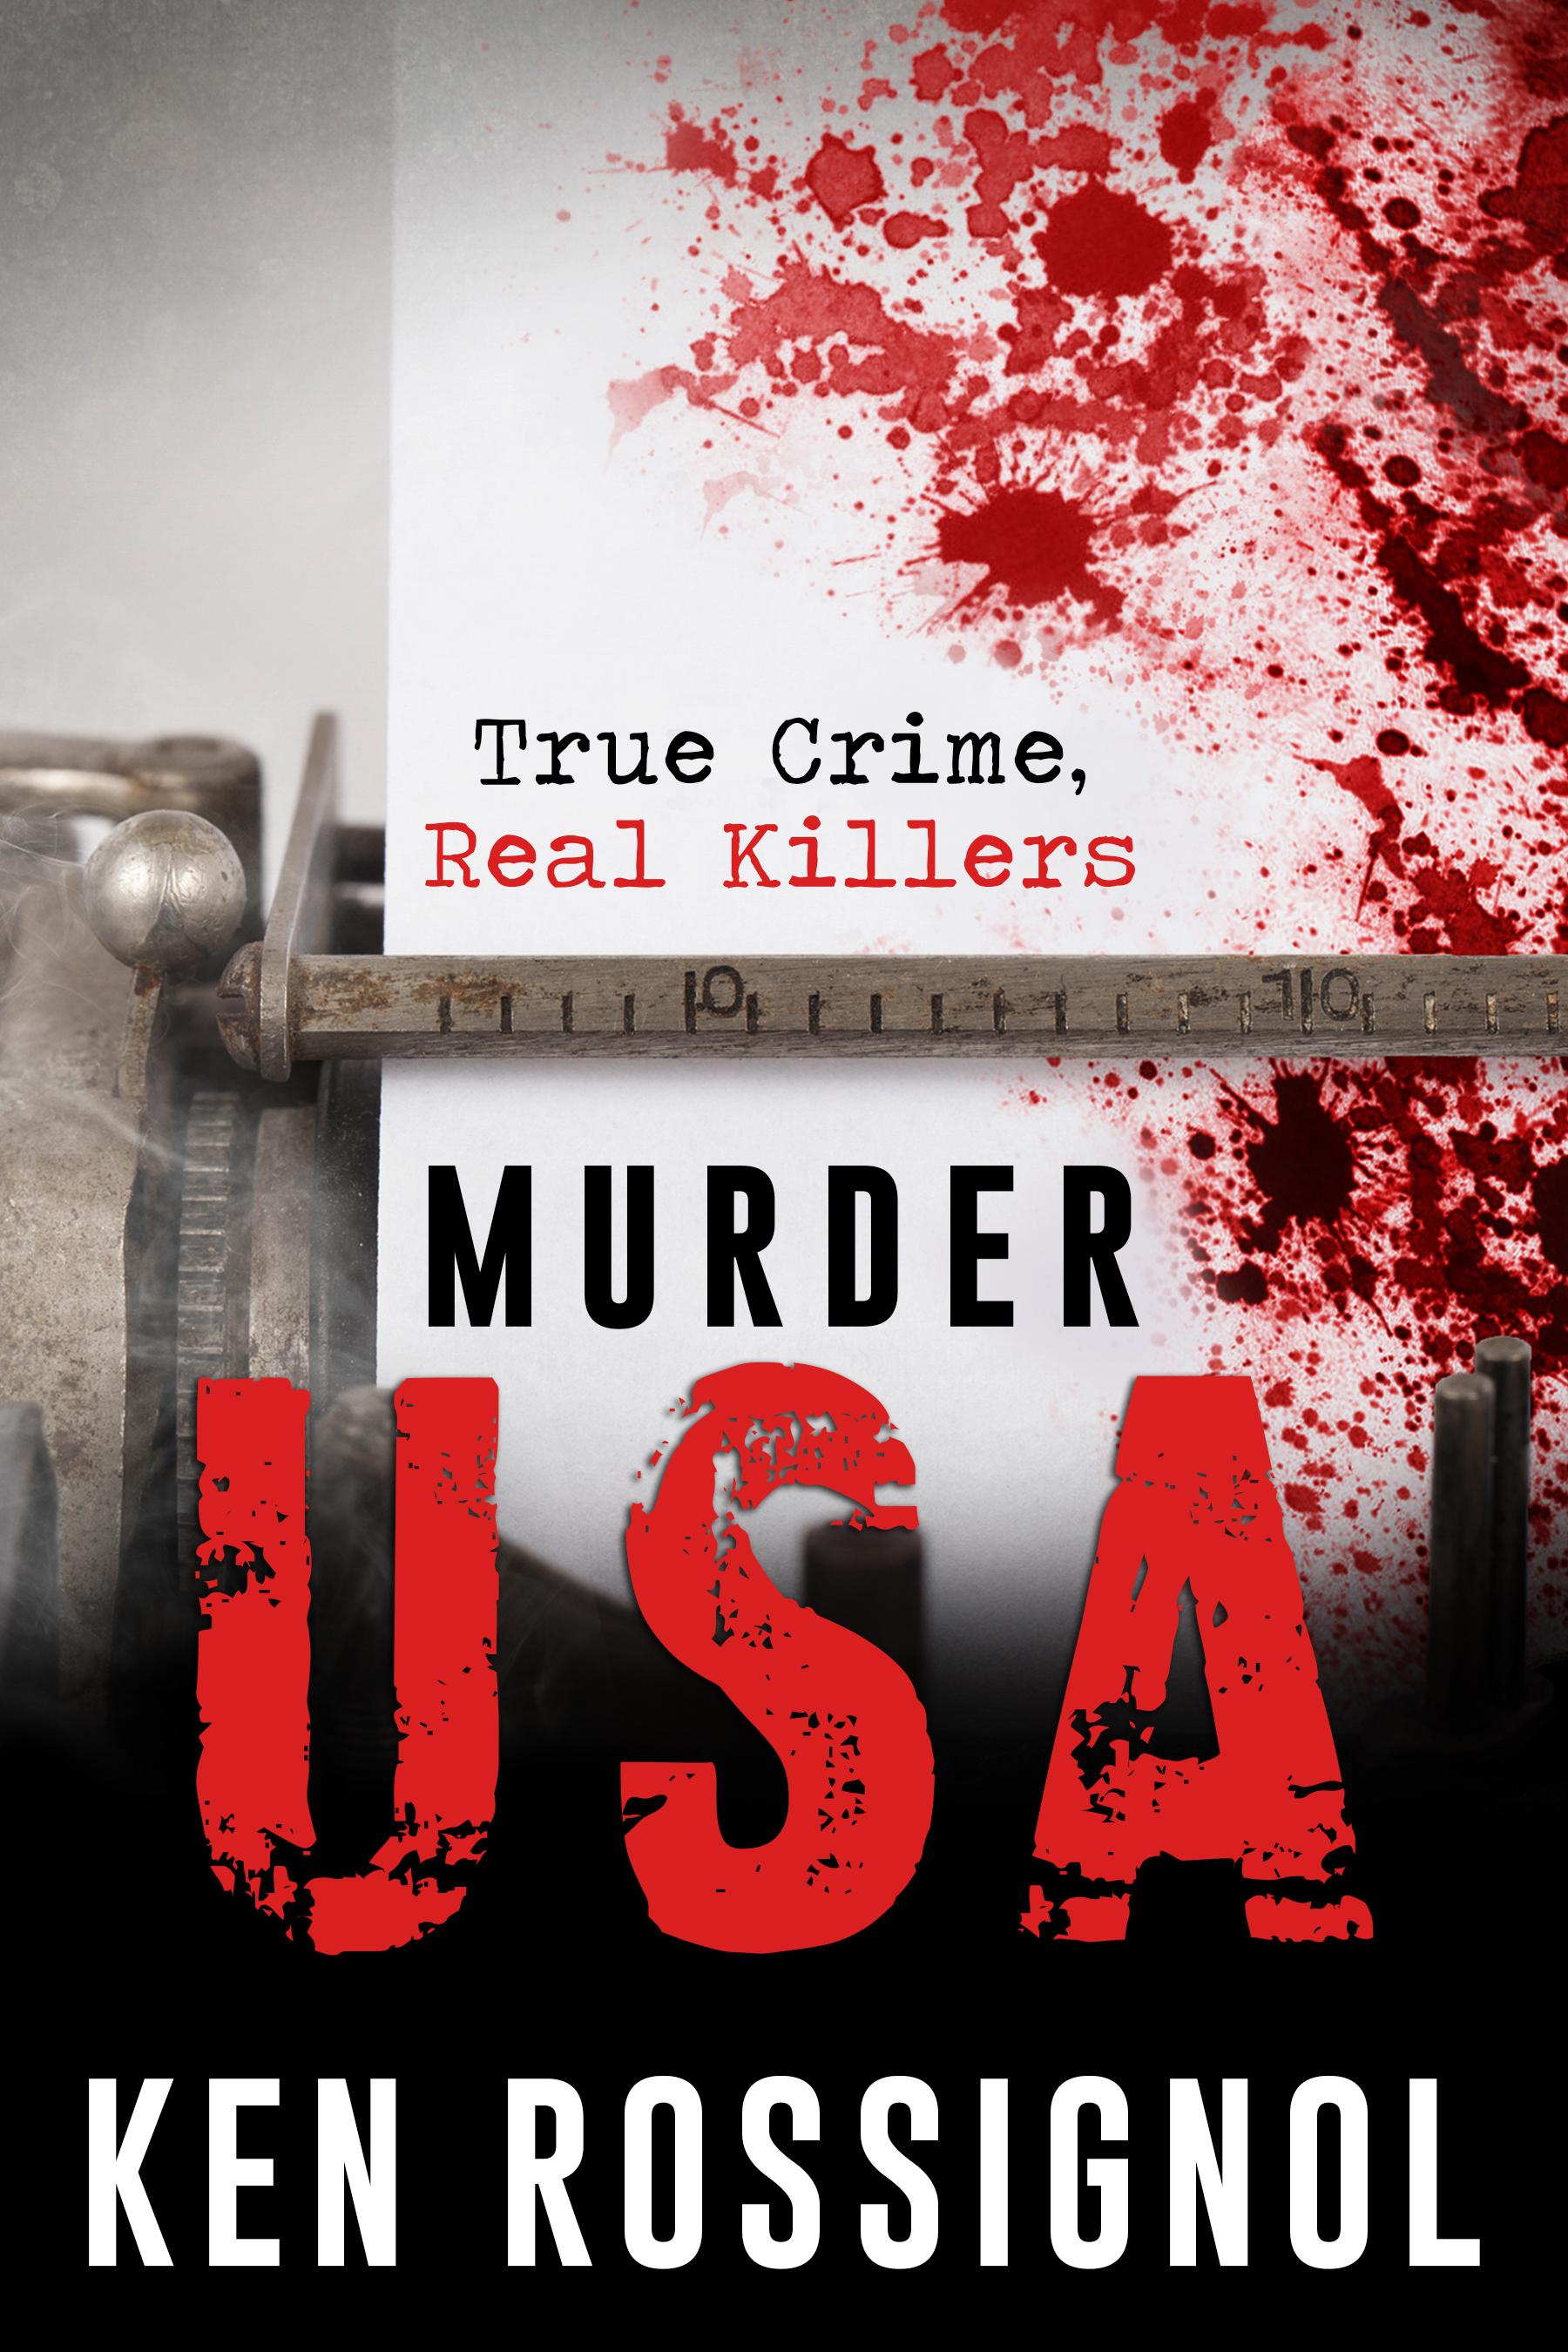 MURDER USA: True Crime, Real Killers